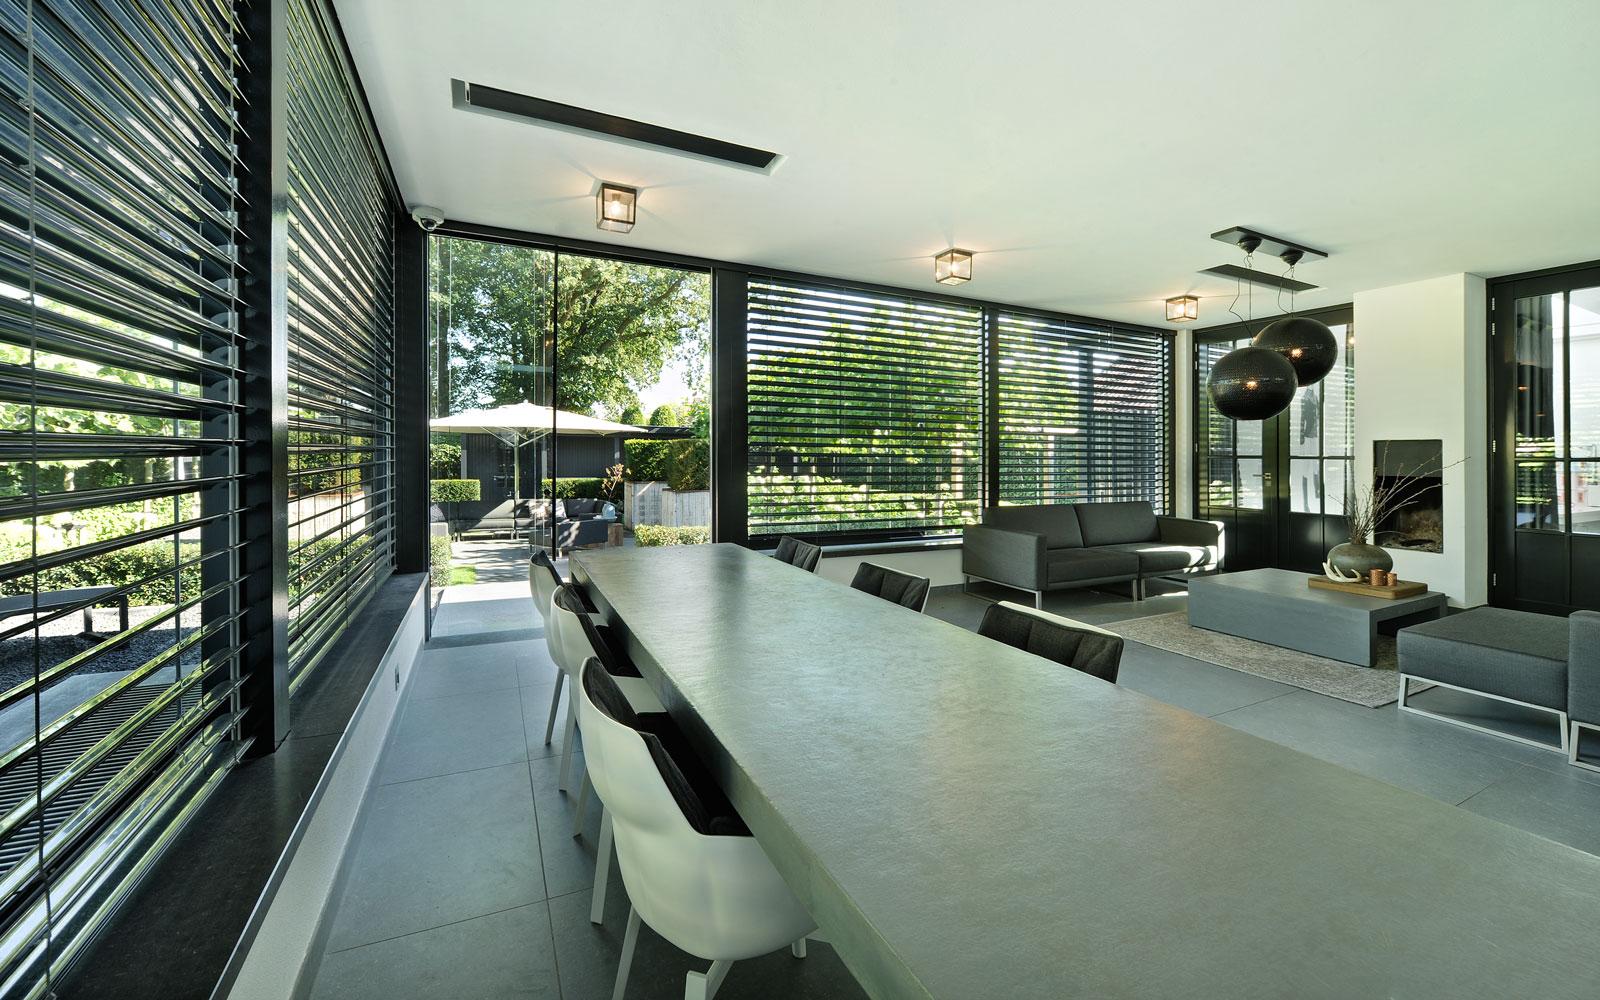 Veranda, binnenruimte, buitenruimte, multifunctioneel, shutters, metamorfose, Boxxis Architecten